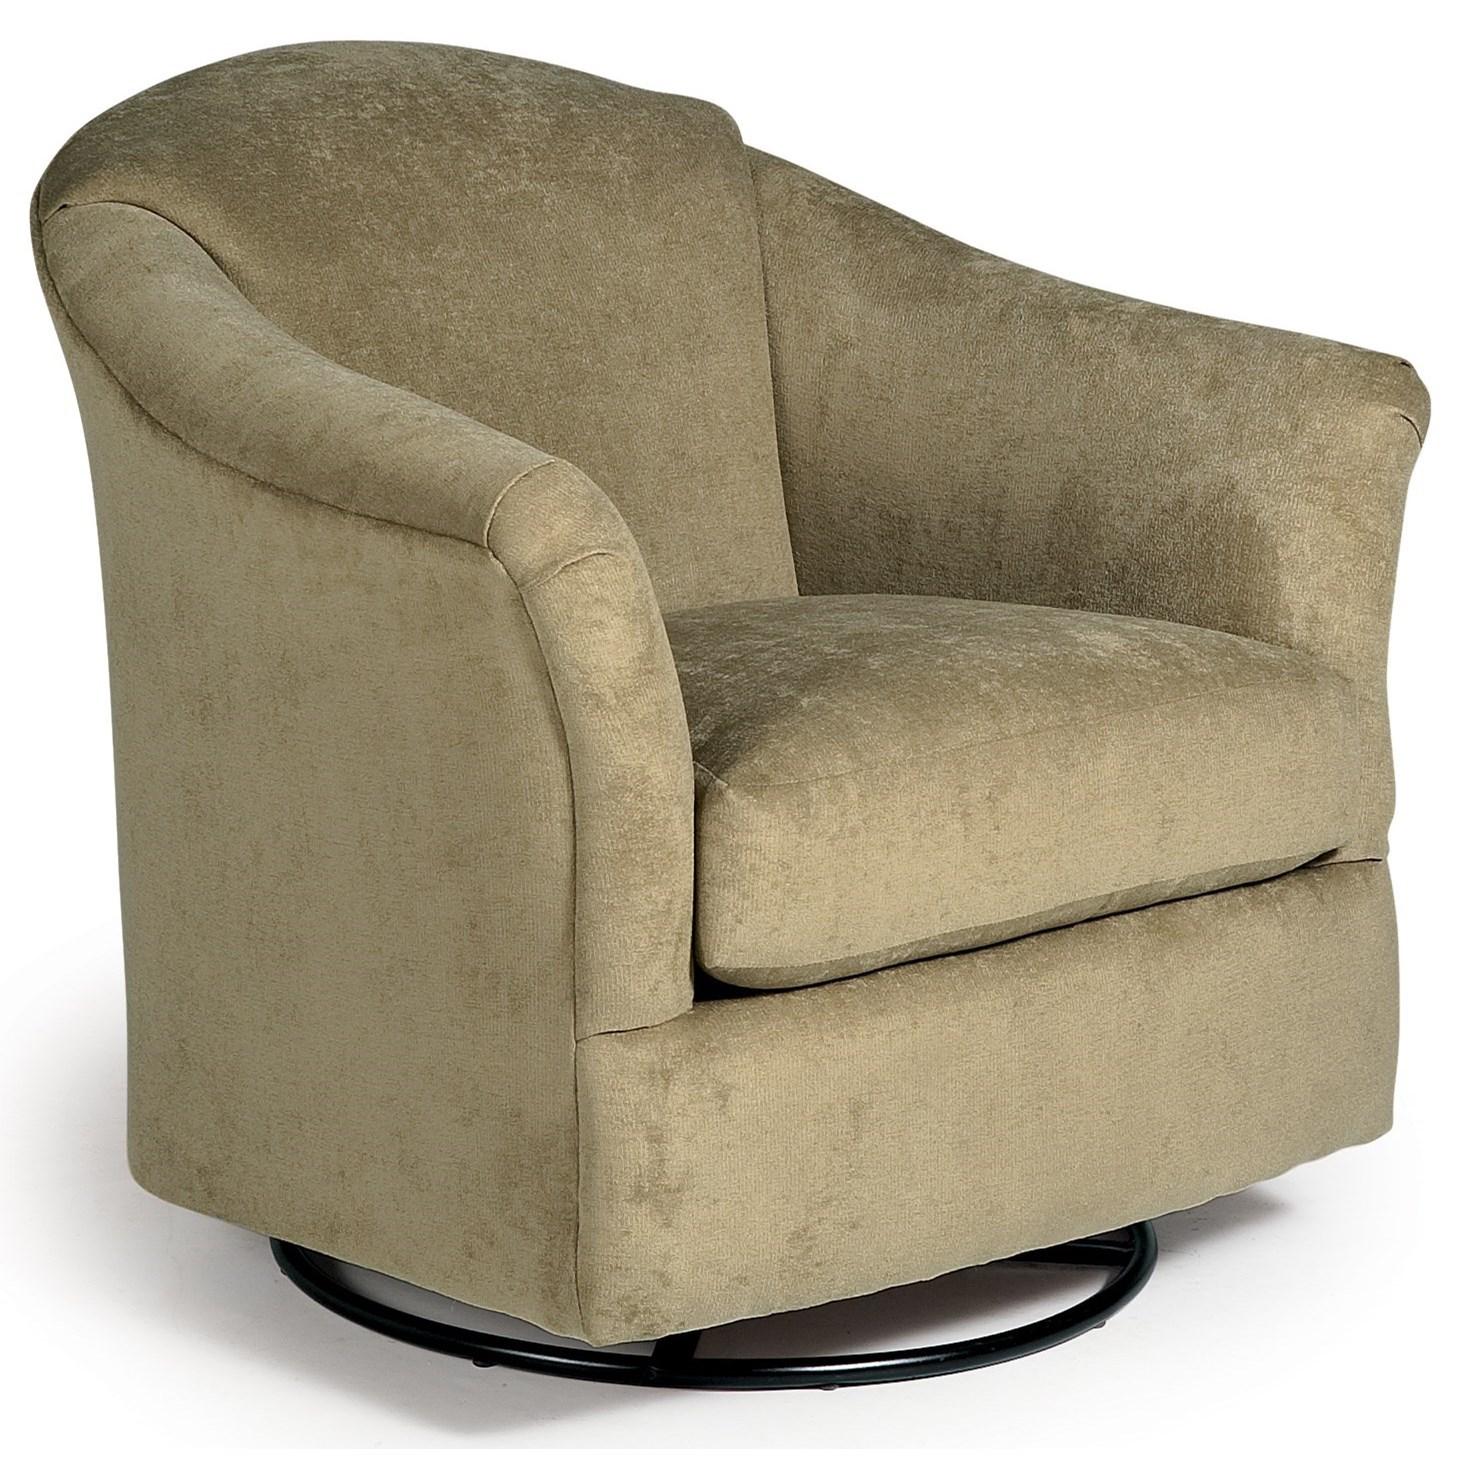 Best Home Furnishings Chairs   Swivel Glide Darby Swivel Glider Chair